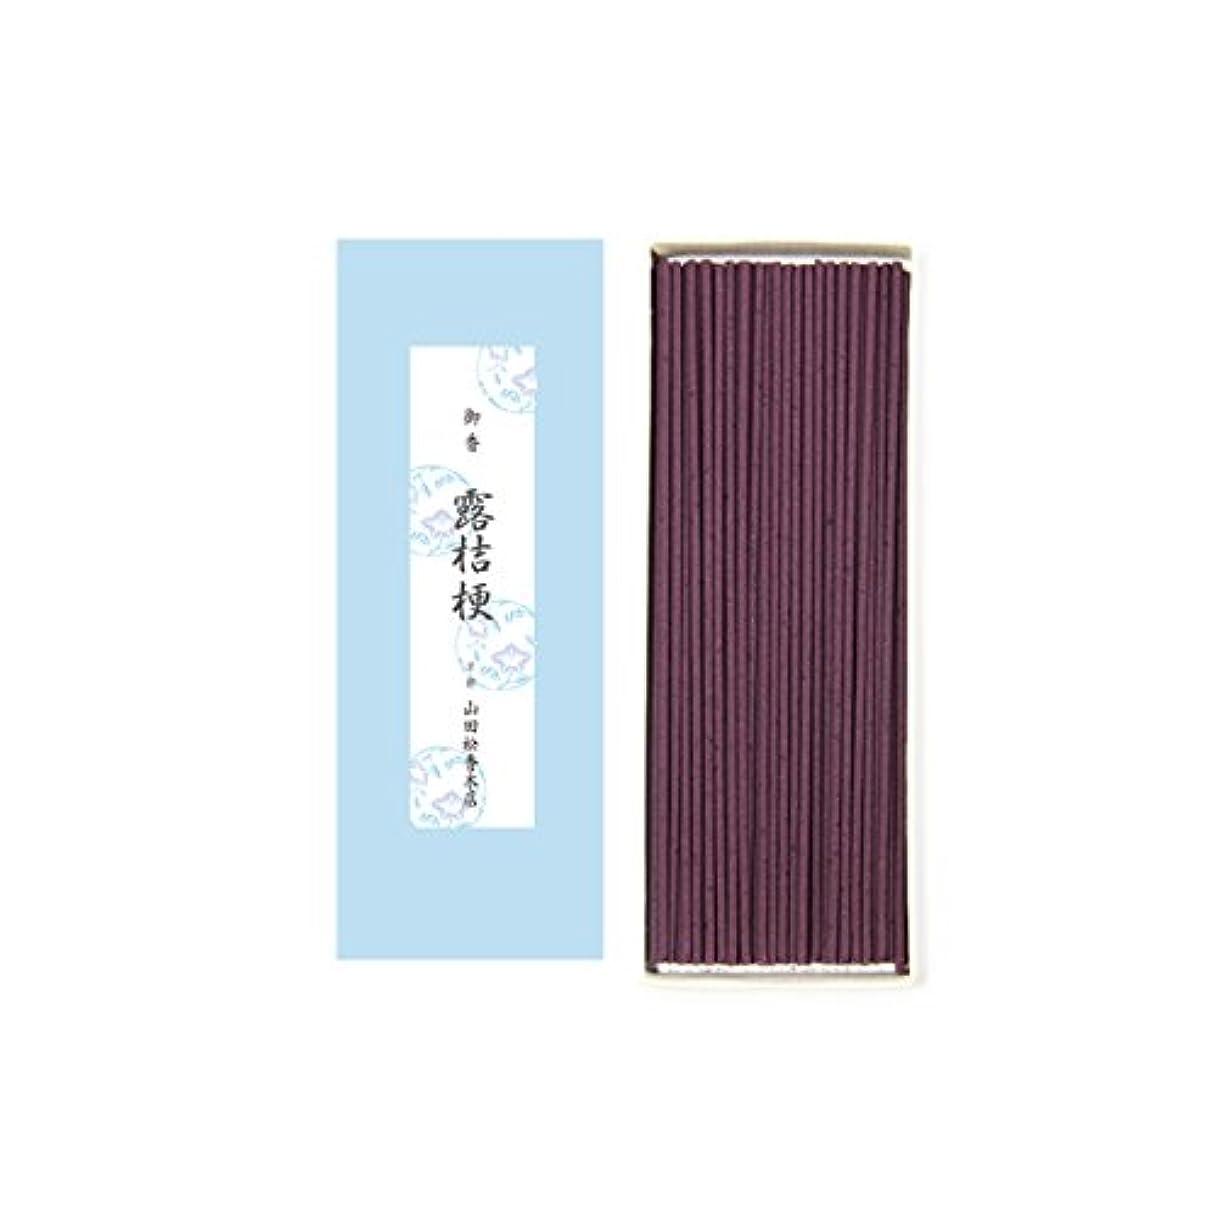 通知する日記儀式線香 露桔梗 5寸 紙箱入